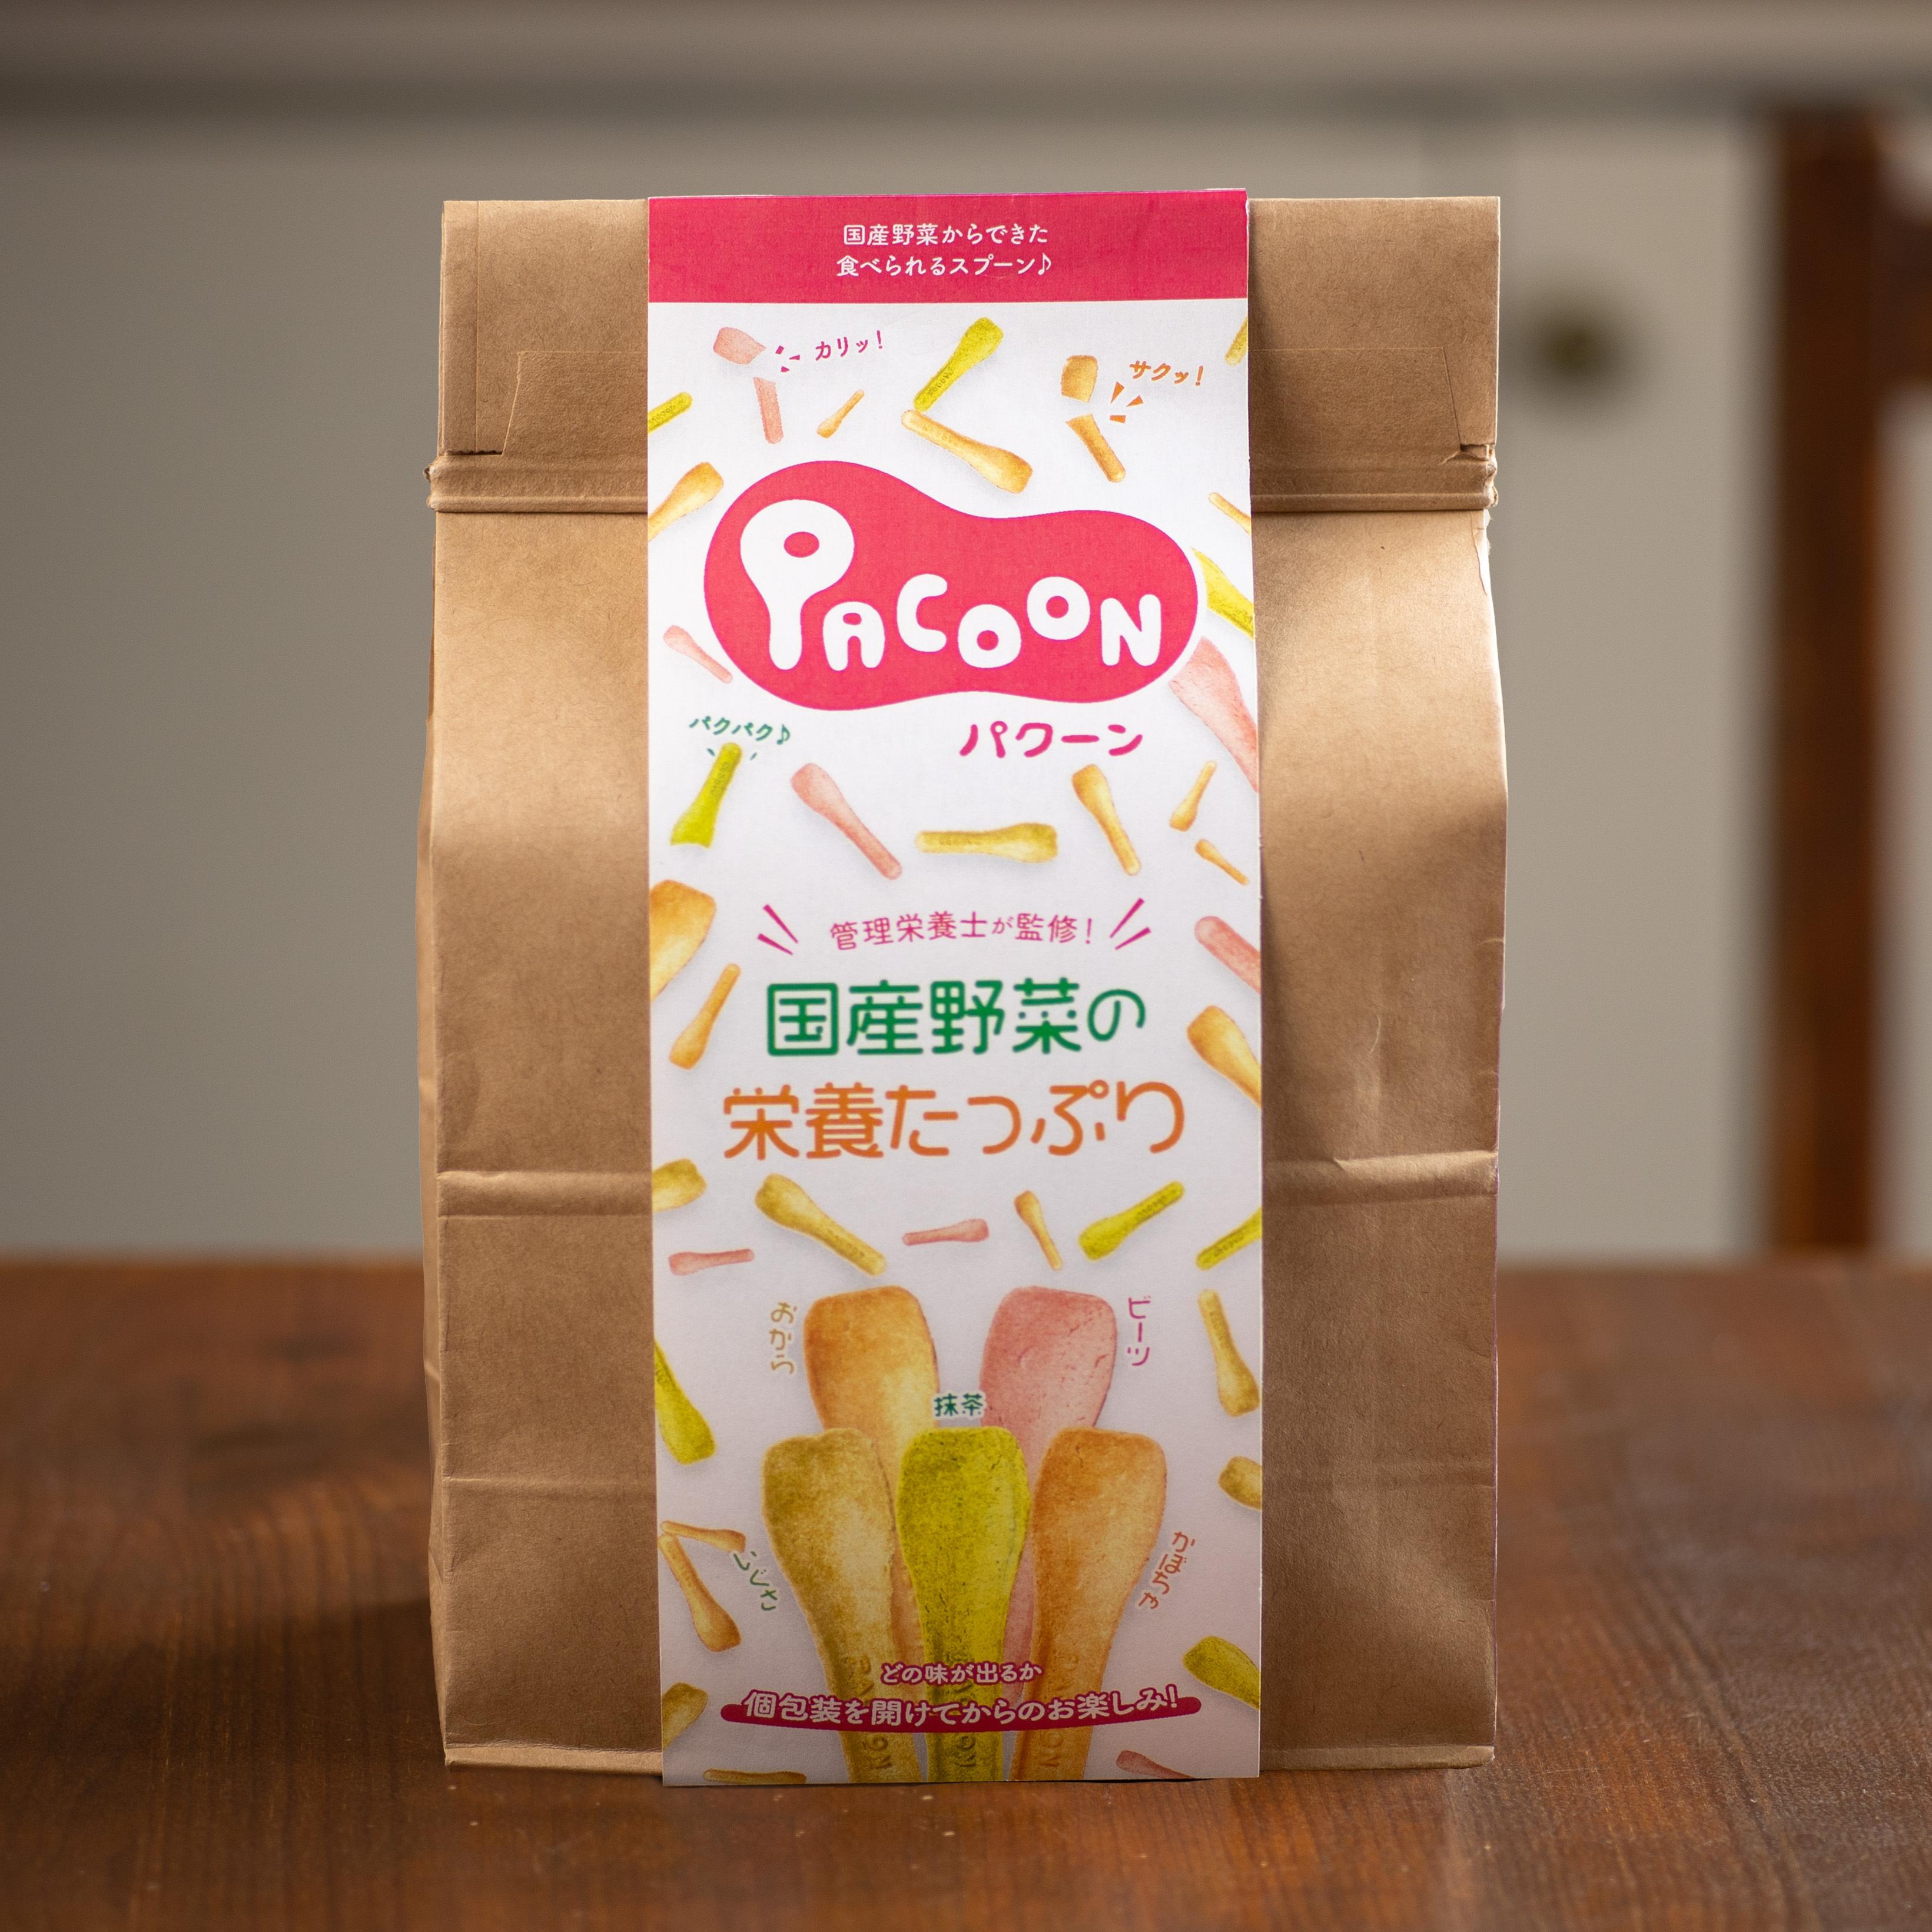 PACOON 5種ミックス (50本入)